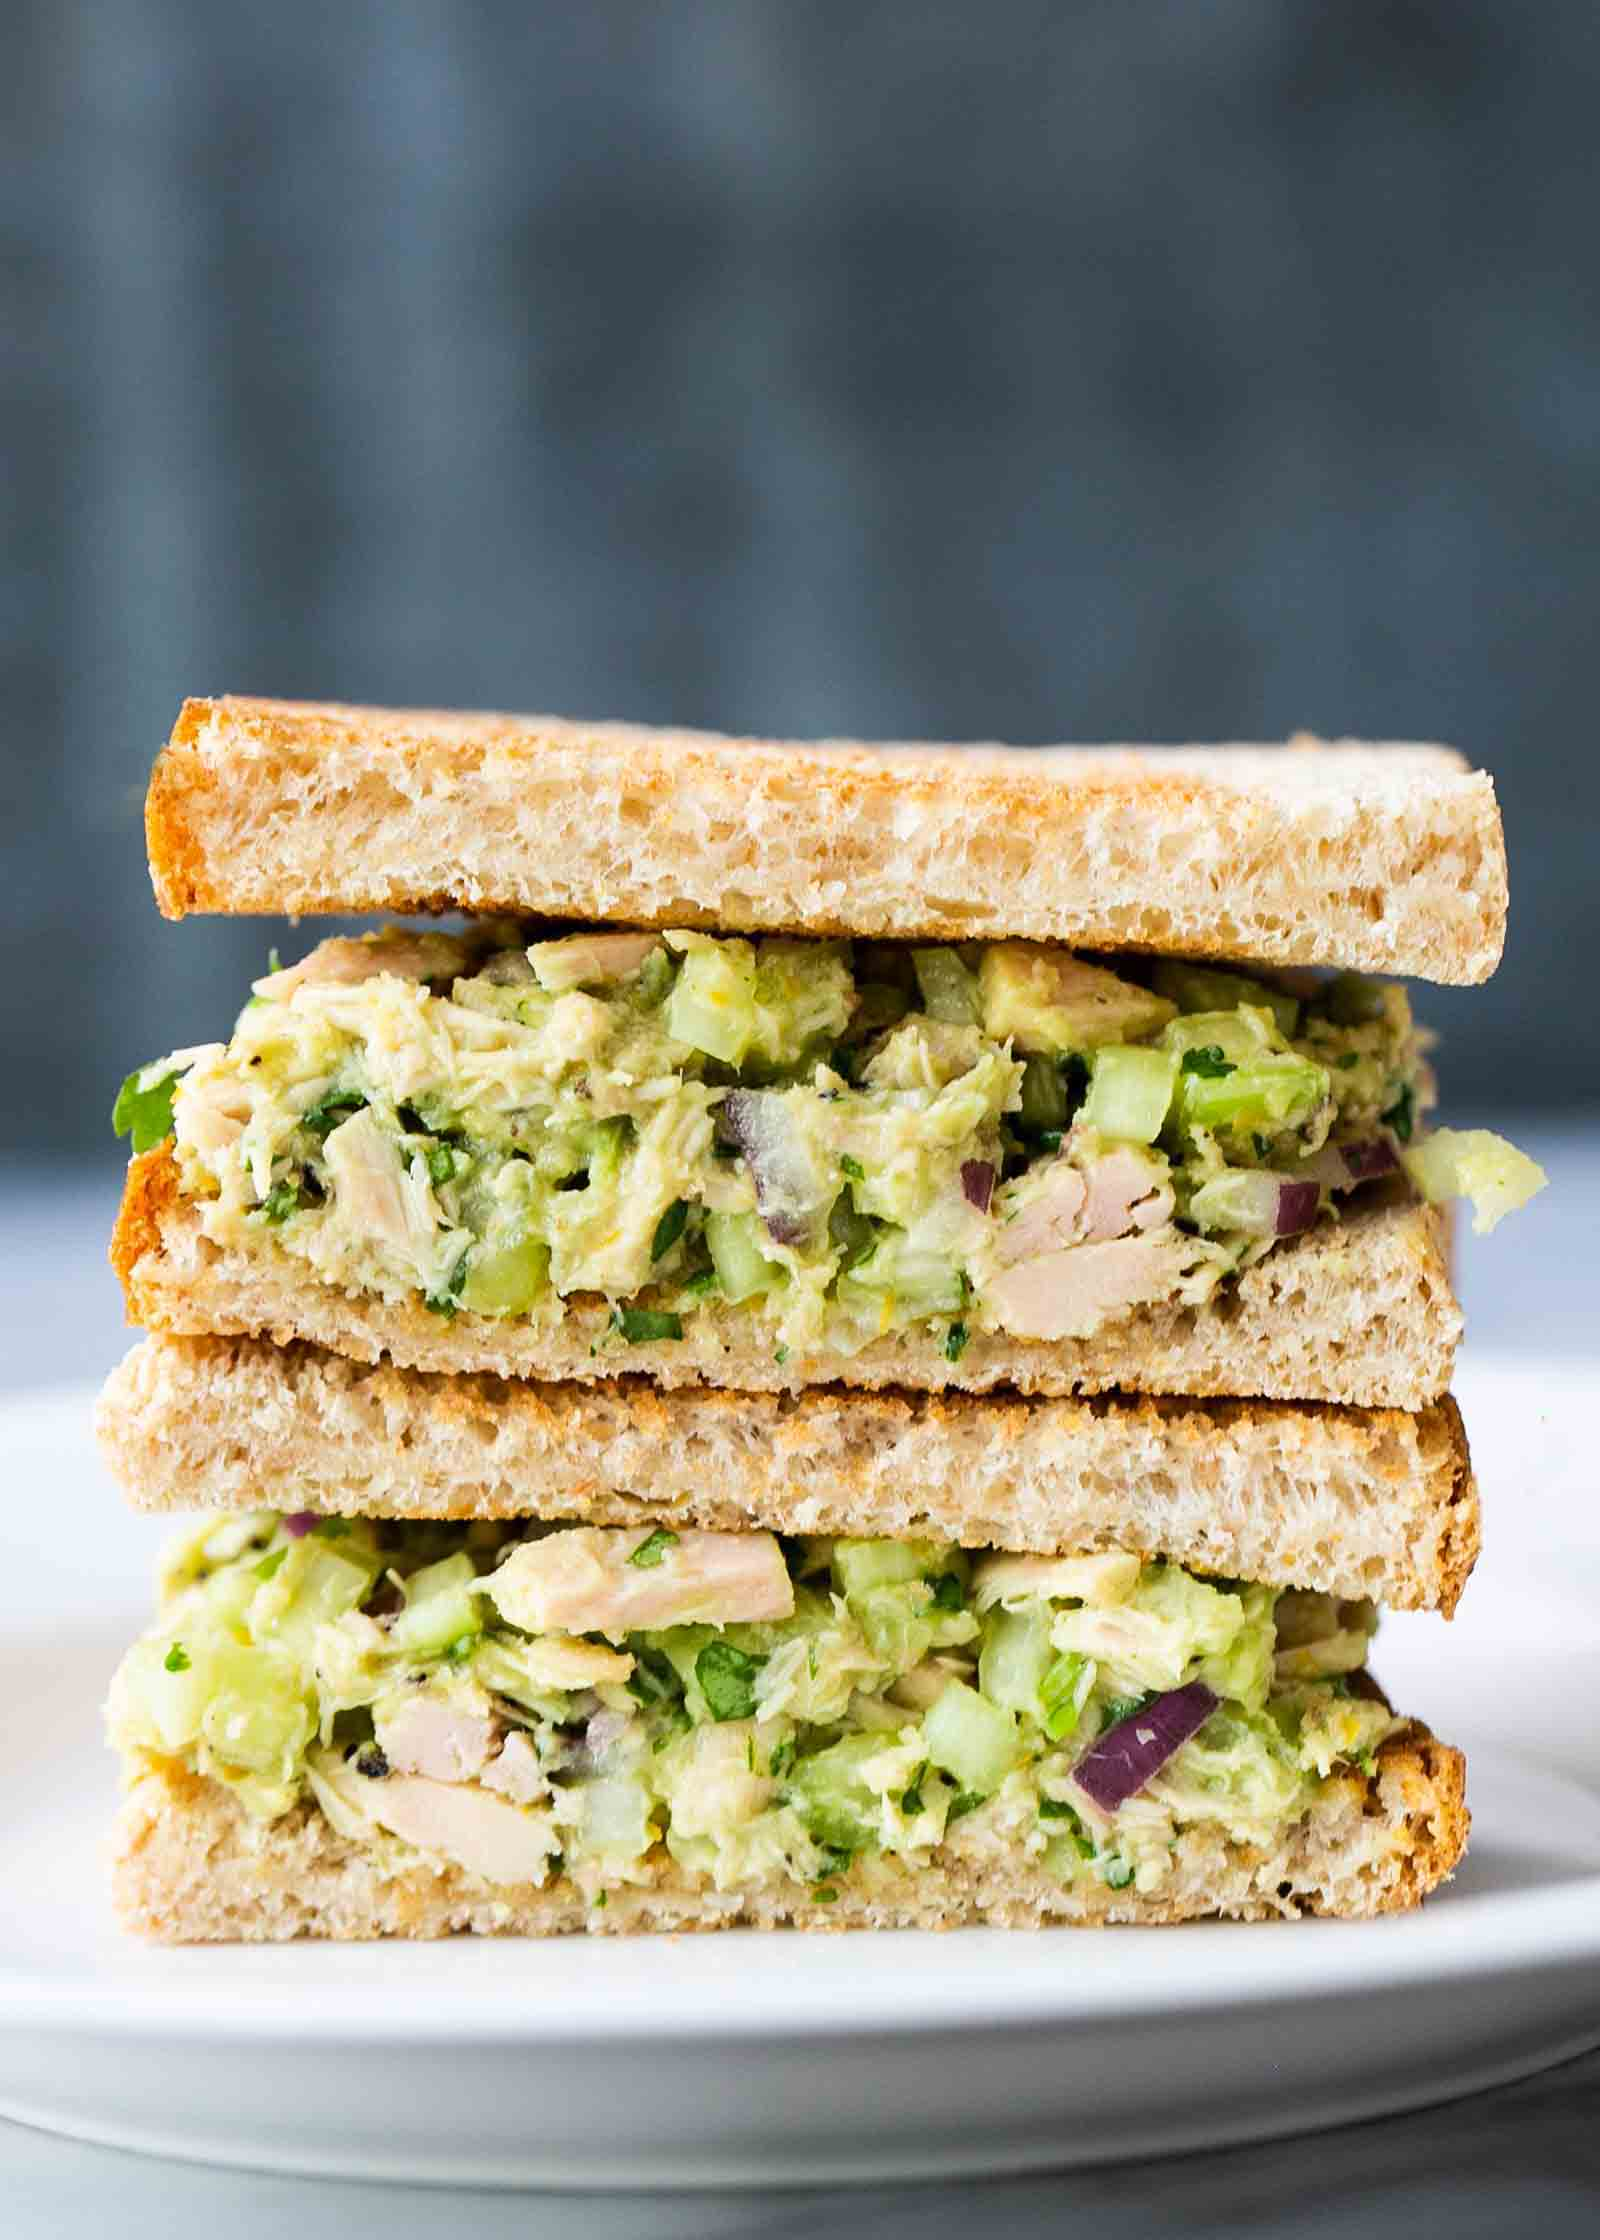 "Avocado tuna salad sandwiches ""width ="" 1600 ""height ="" 2240 ""srcset ="" https://cdn.diys.com/wp-content/uploads/2020/06/Avocado-tuna-salad-sandwiches.jpg 1600w, https : //cdn.diys.com/wp-content/uploads/2020/06/Avocado-tuna-salad-sandwiches-214x300.jpg 214w, https://cdn.diys.com/wp-content/uploads/2020/ 06 / Avocado-tuna-salad-sandwiches-731x1024.jpg 731w, https://cdn.diys.com/wp-content/uploads/2020/06/Avocado-tuna-salad-sandwiches-768x1075.jpg 768w, https: //cdn.diys.com/wp-content/uploads/2020/06/Avocado-tuna-salad-sandwiches-1097x1536.jpg 1097w, https://cdn.diys.com/wp-content/uploads/2020/06 /Avocado-tuna-salad-sandwiches-1463x2048.jpg 1463w ""dimensions ="" (maximum width: 1600px) 100vw, 1600px"